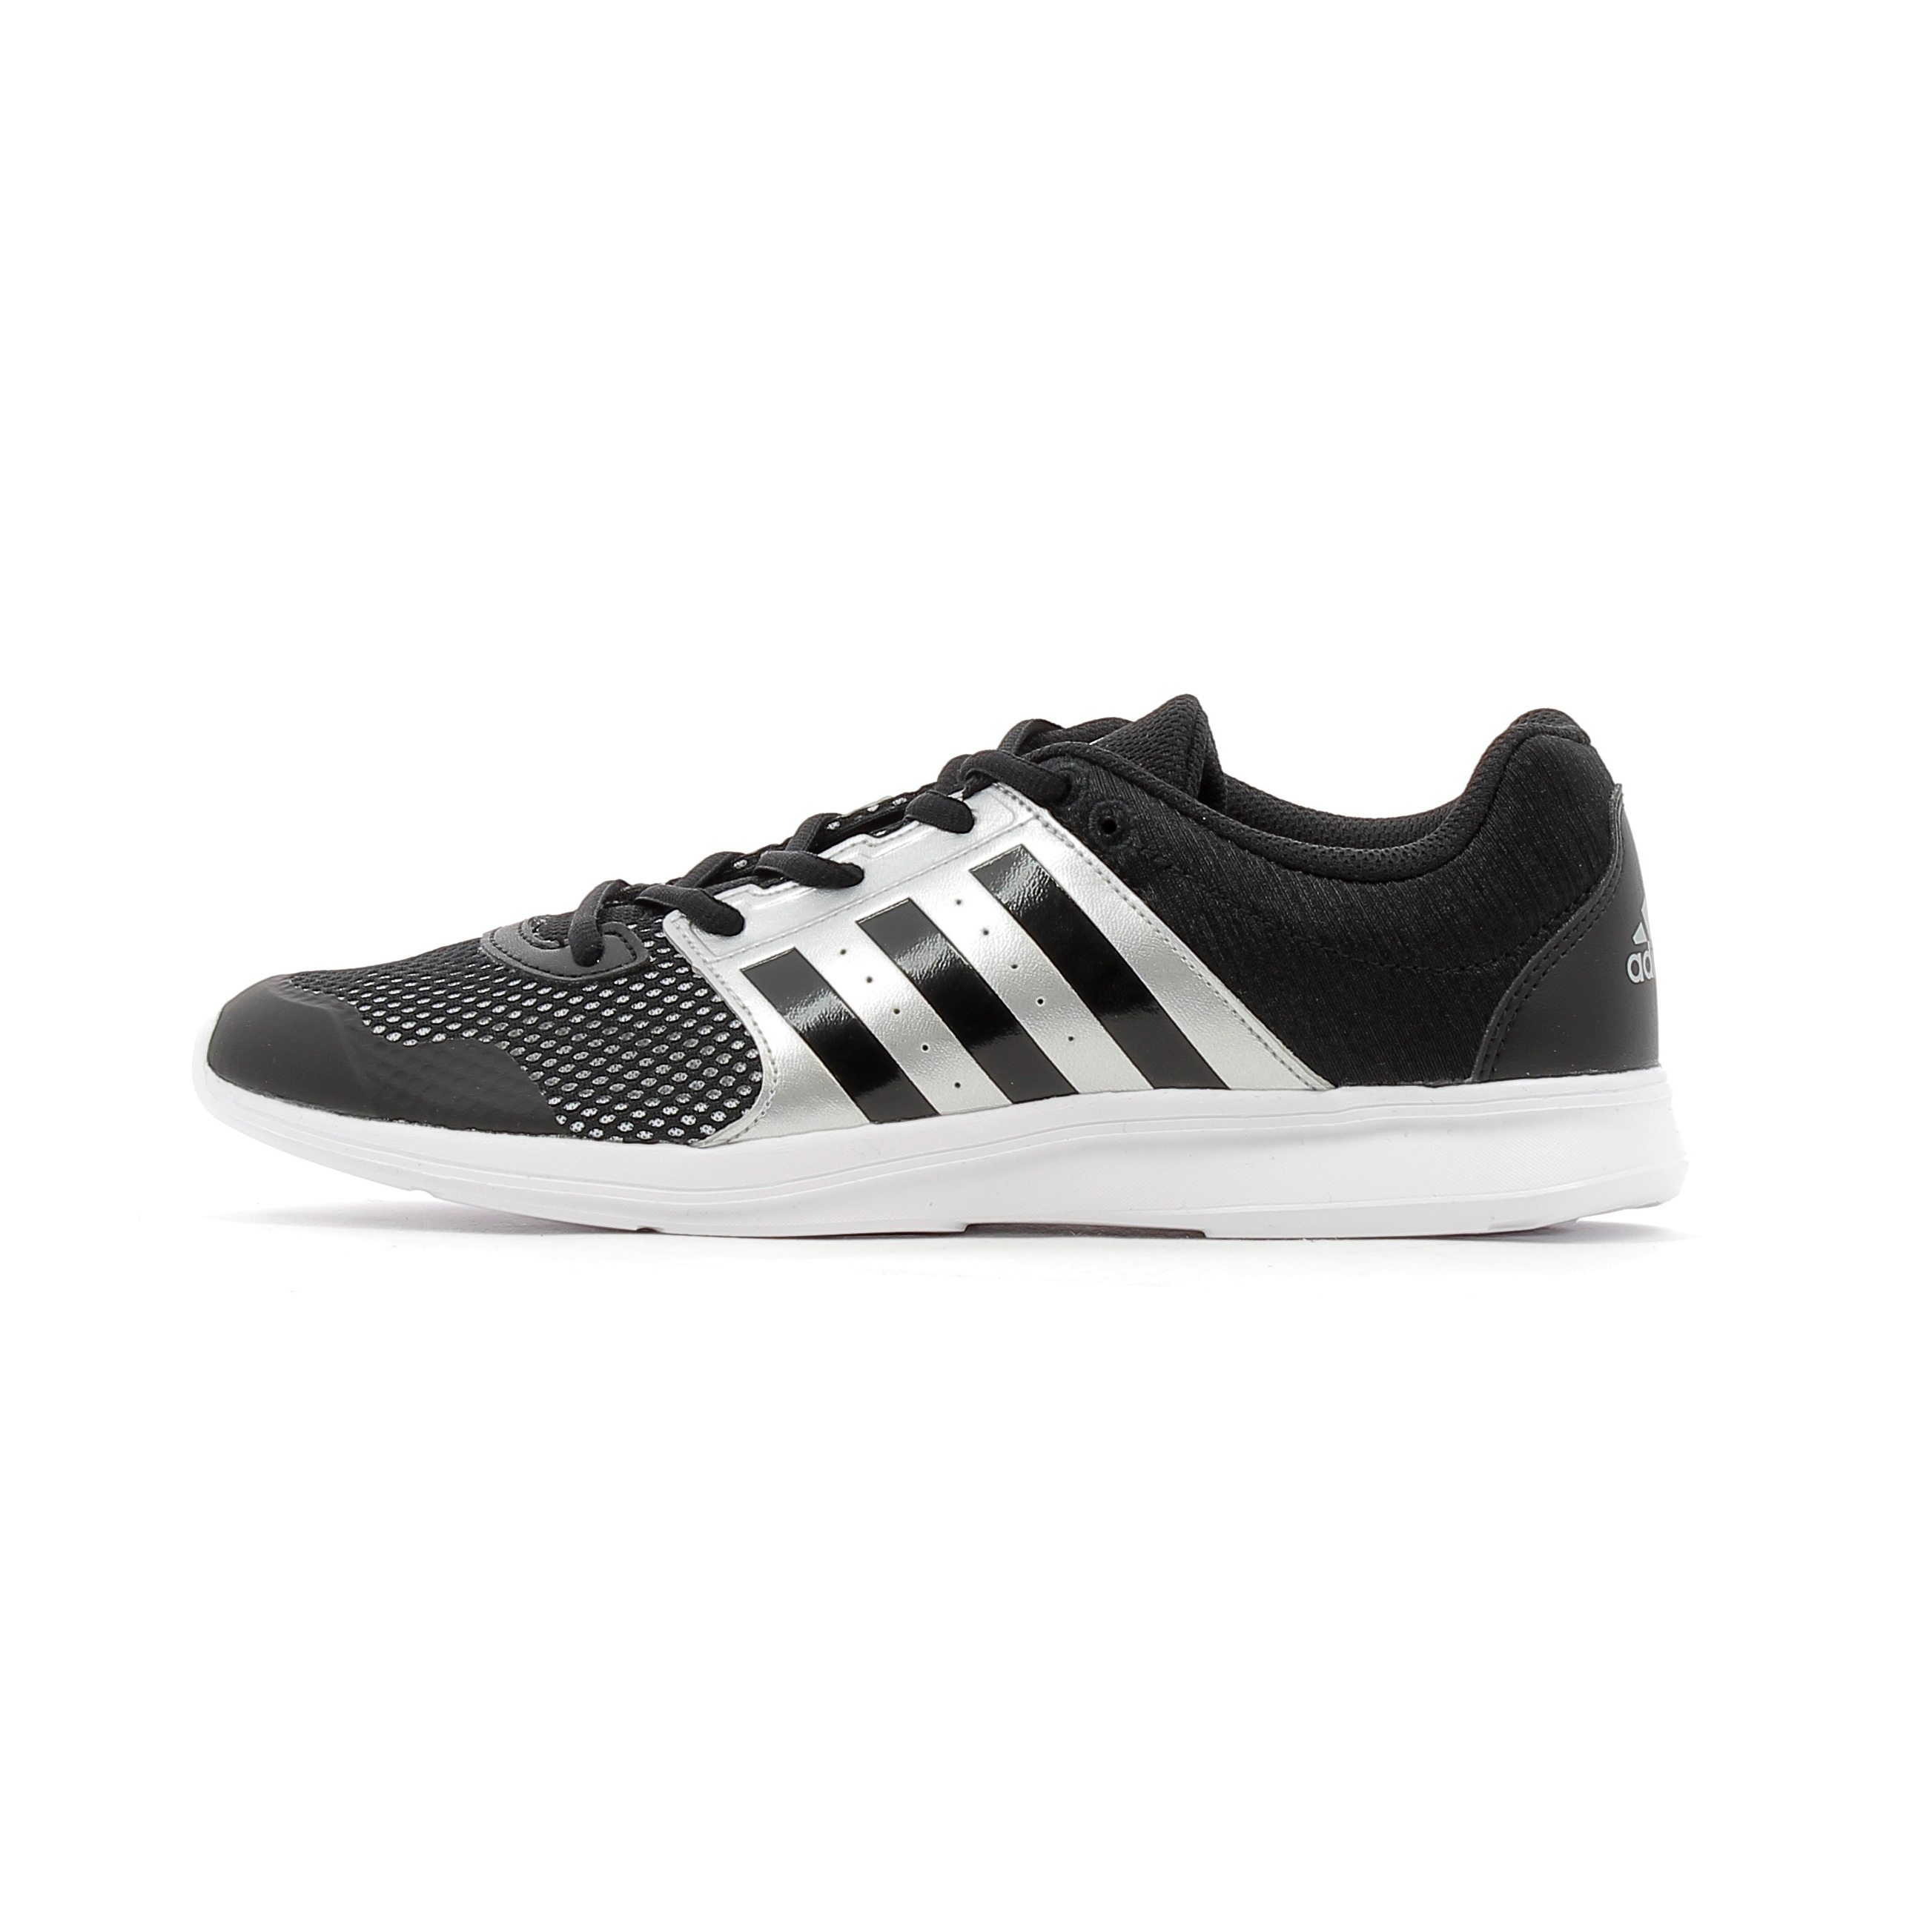 Training Fun W Cross Essential De 2 Adidas Running Femme Chaussures qEU6nxTw